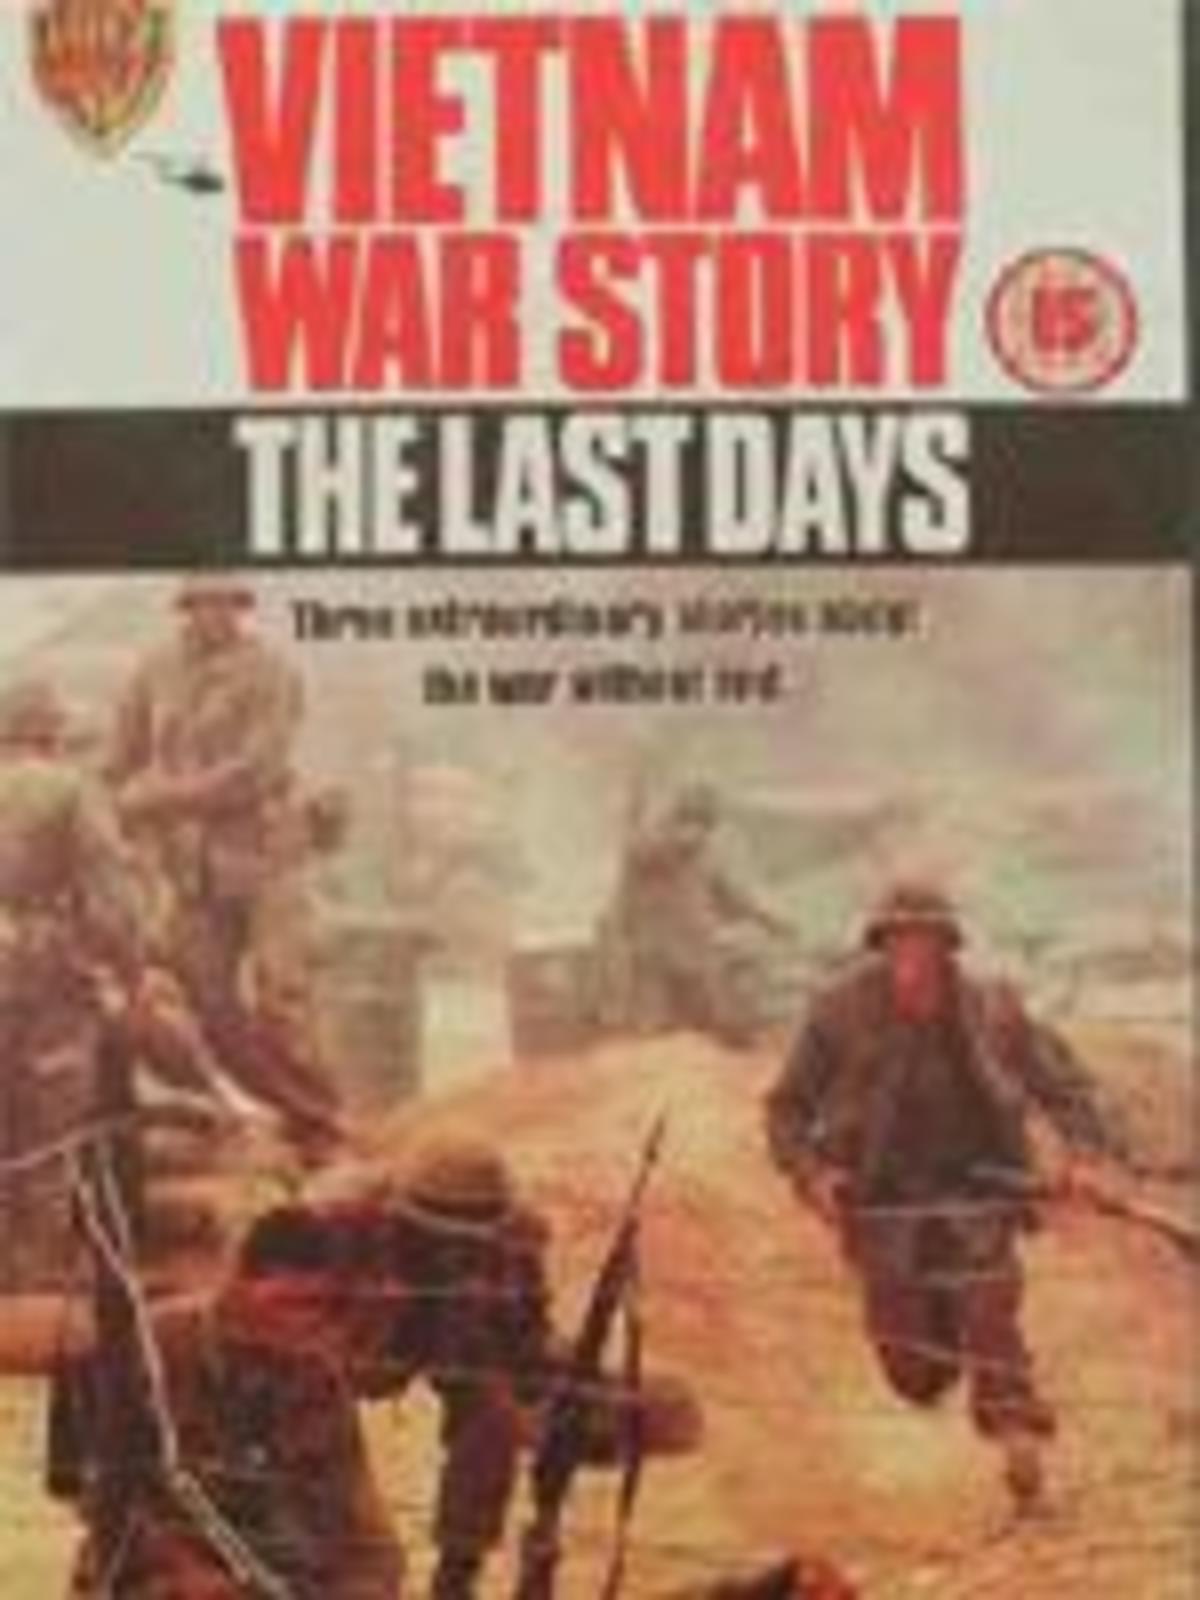 Vietnam War Story: The Last Days (1989)